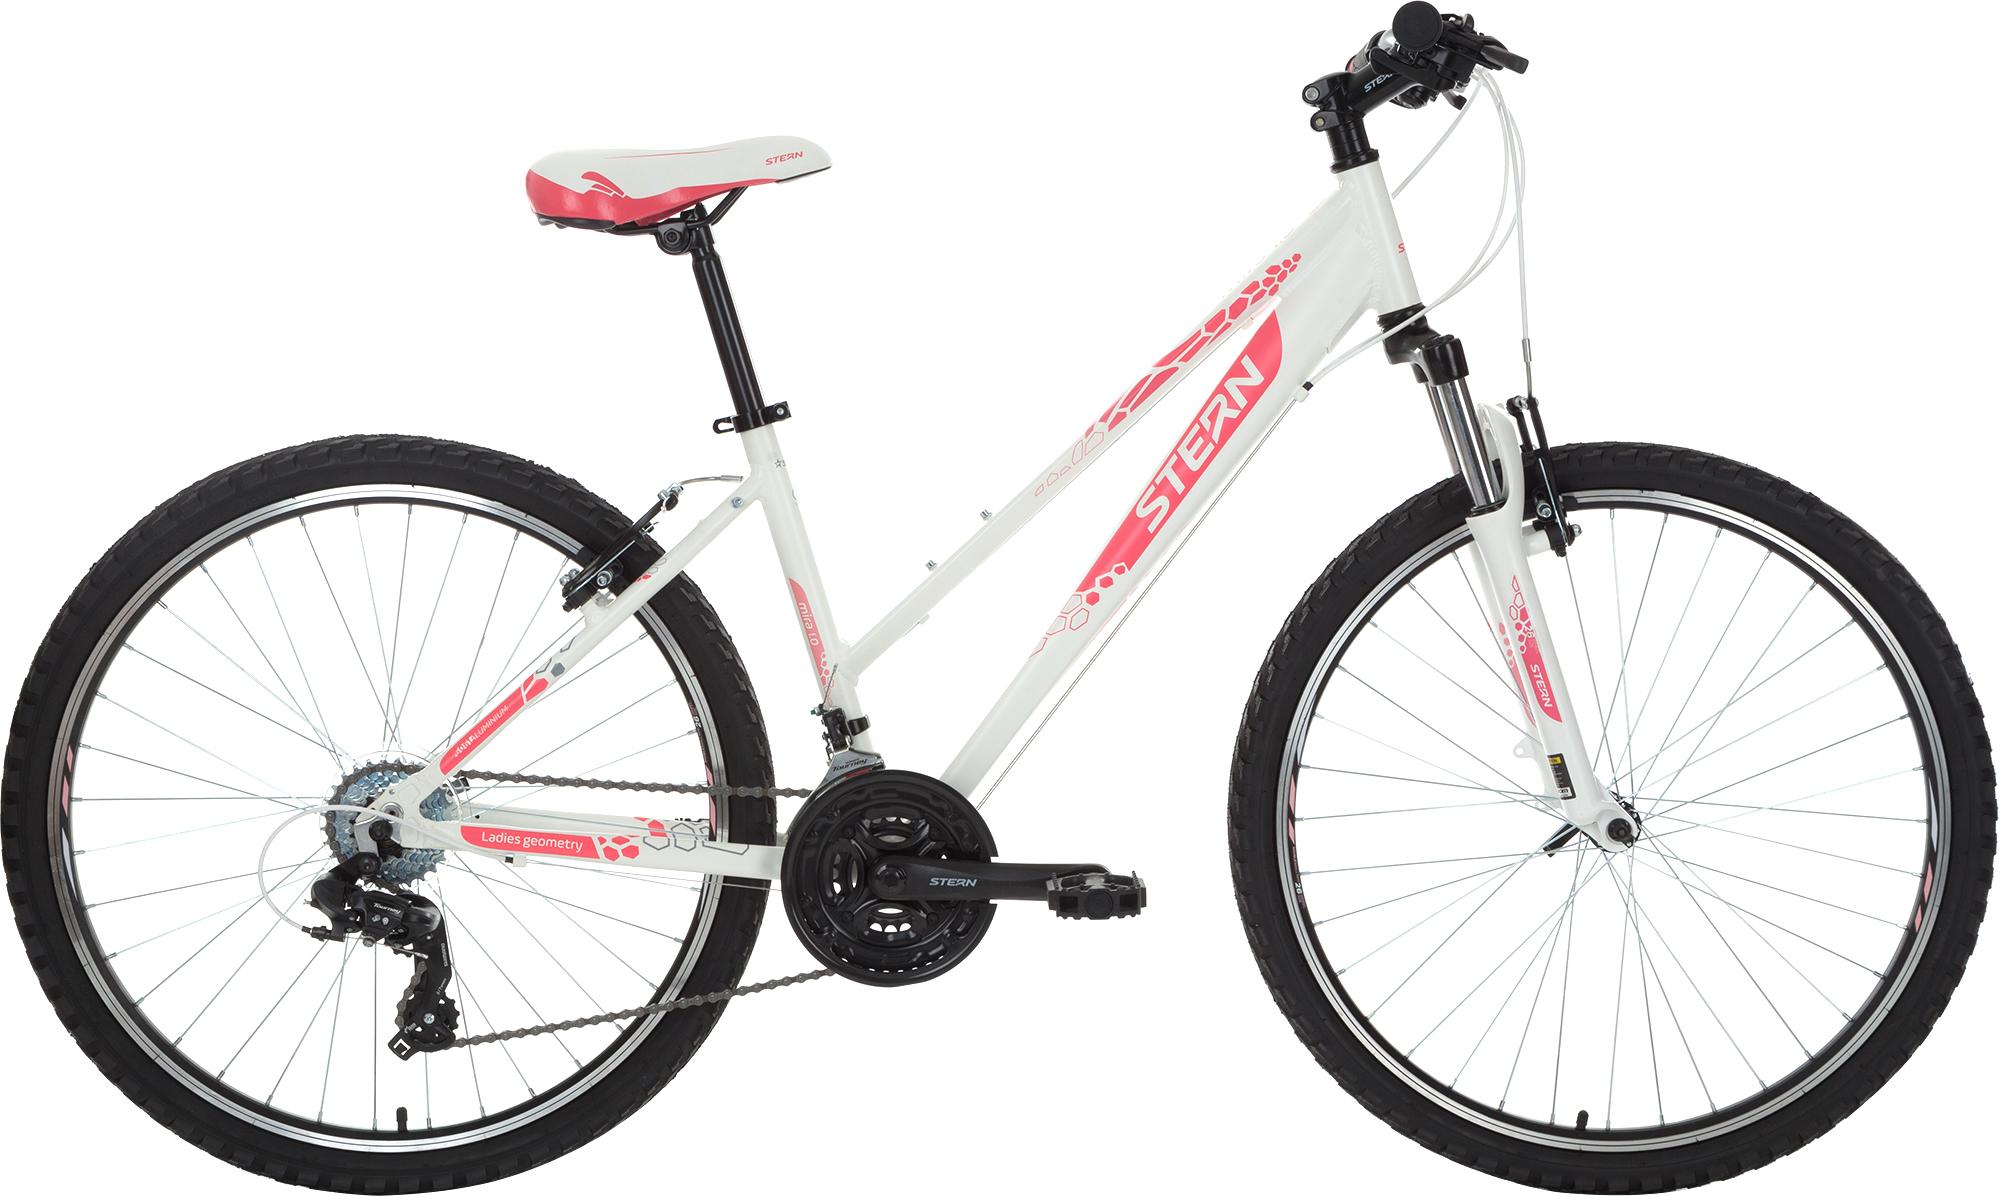 Stern Stern Mira 1.0 26 (2018) stern велосипед горный stern dynamic fs 1 0 26